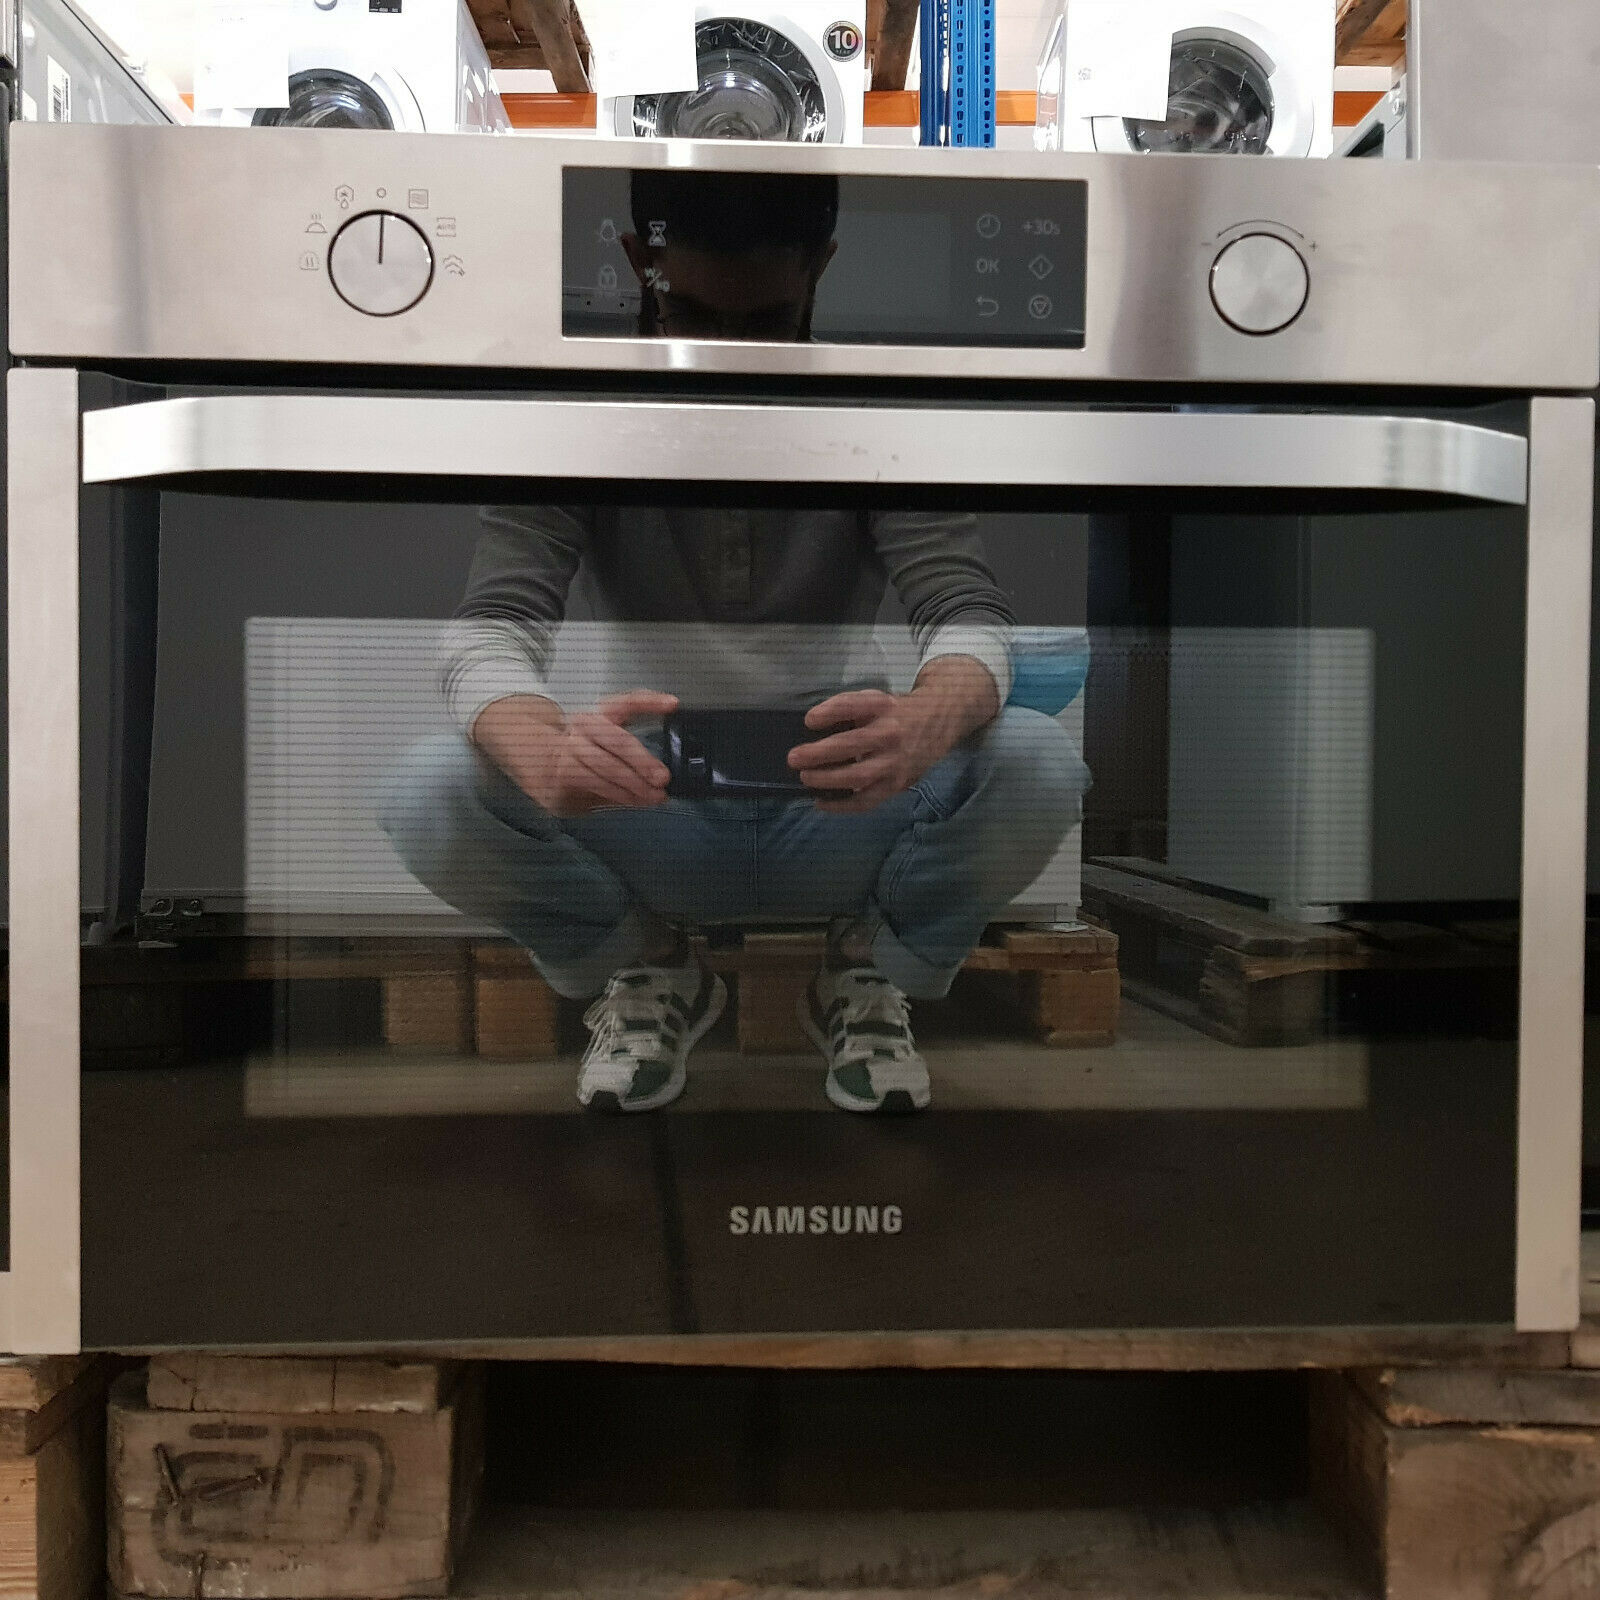 Samsung Einbau-Mikrowelle SOLO 50 L Edelstahl 20 Programme NQ50K3130BS B-Ware*